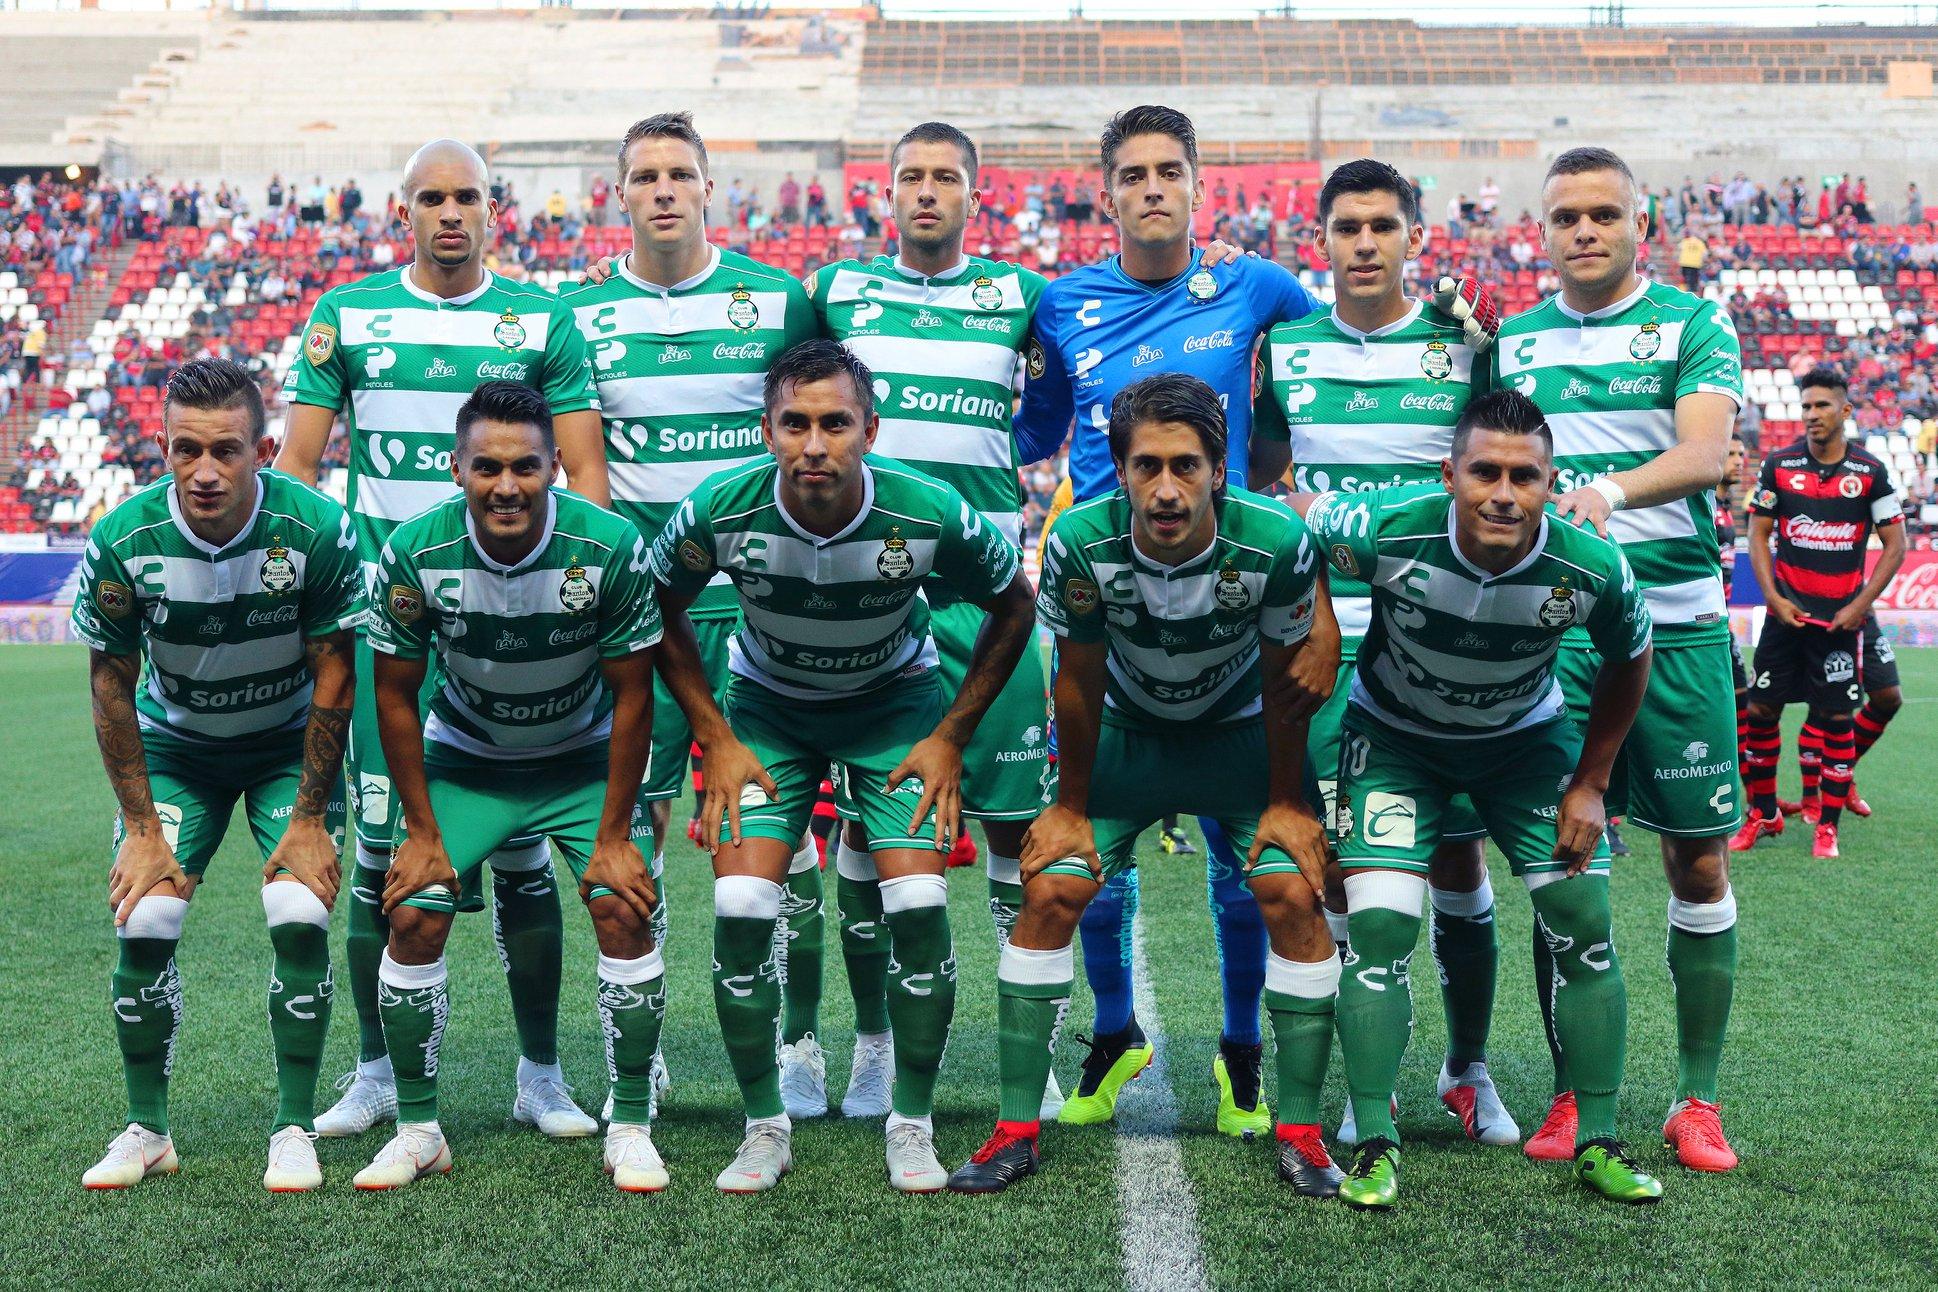 Messico-Liga-MX-pronostico-10 novembre-2019-analisi-e-pronostico